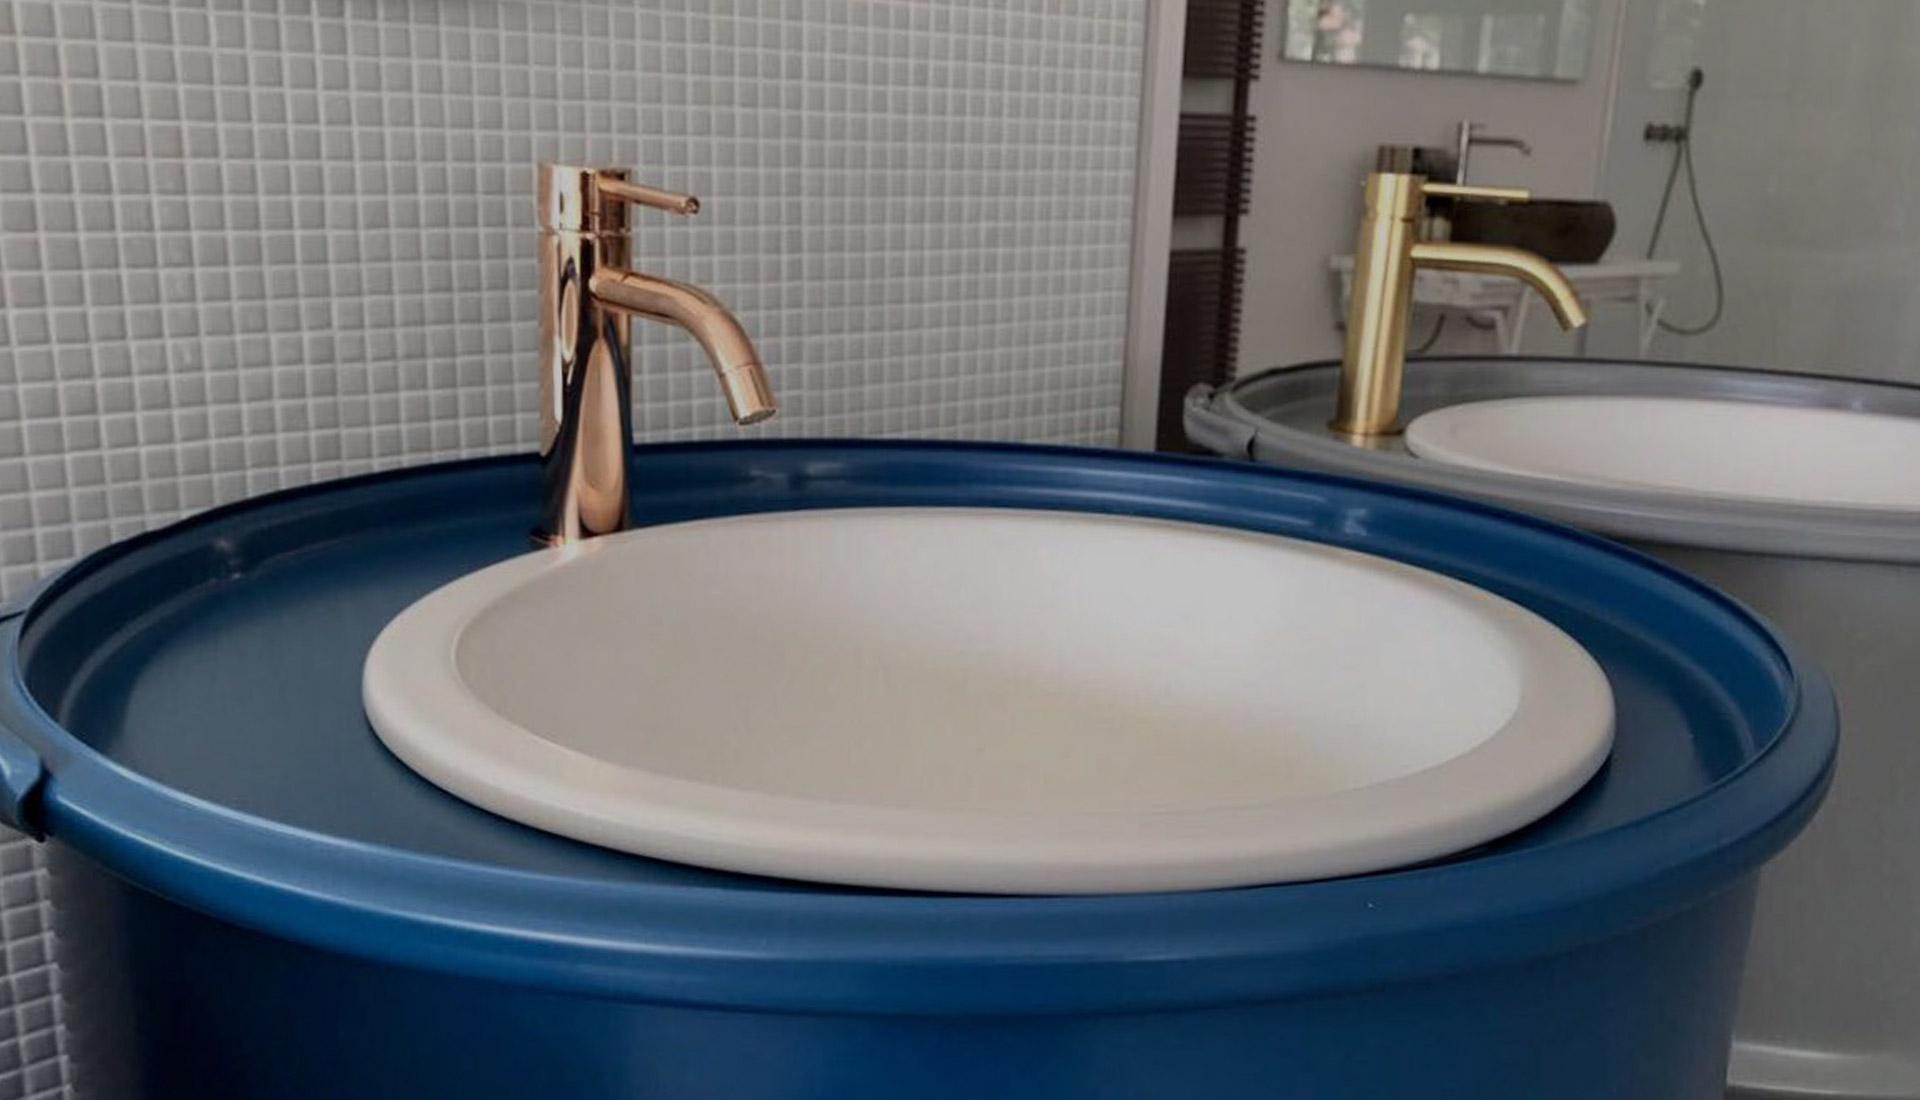 bidone lavabo Sink blu